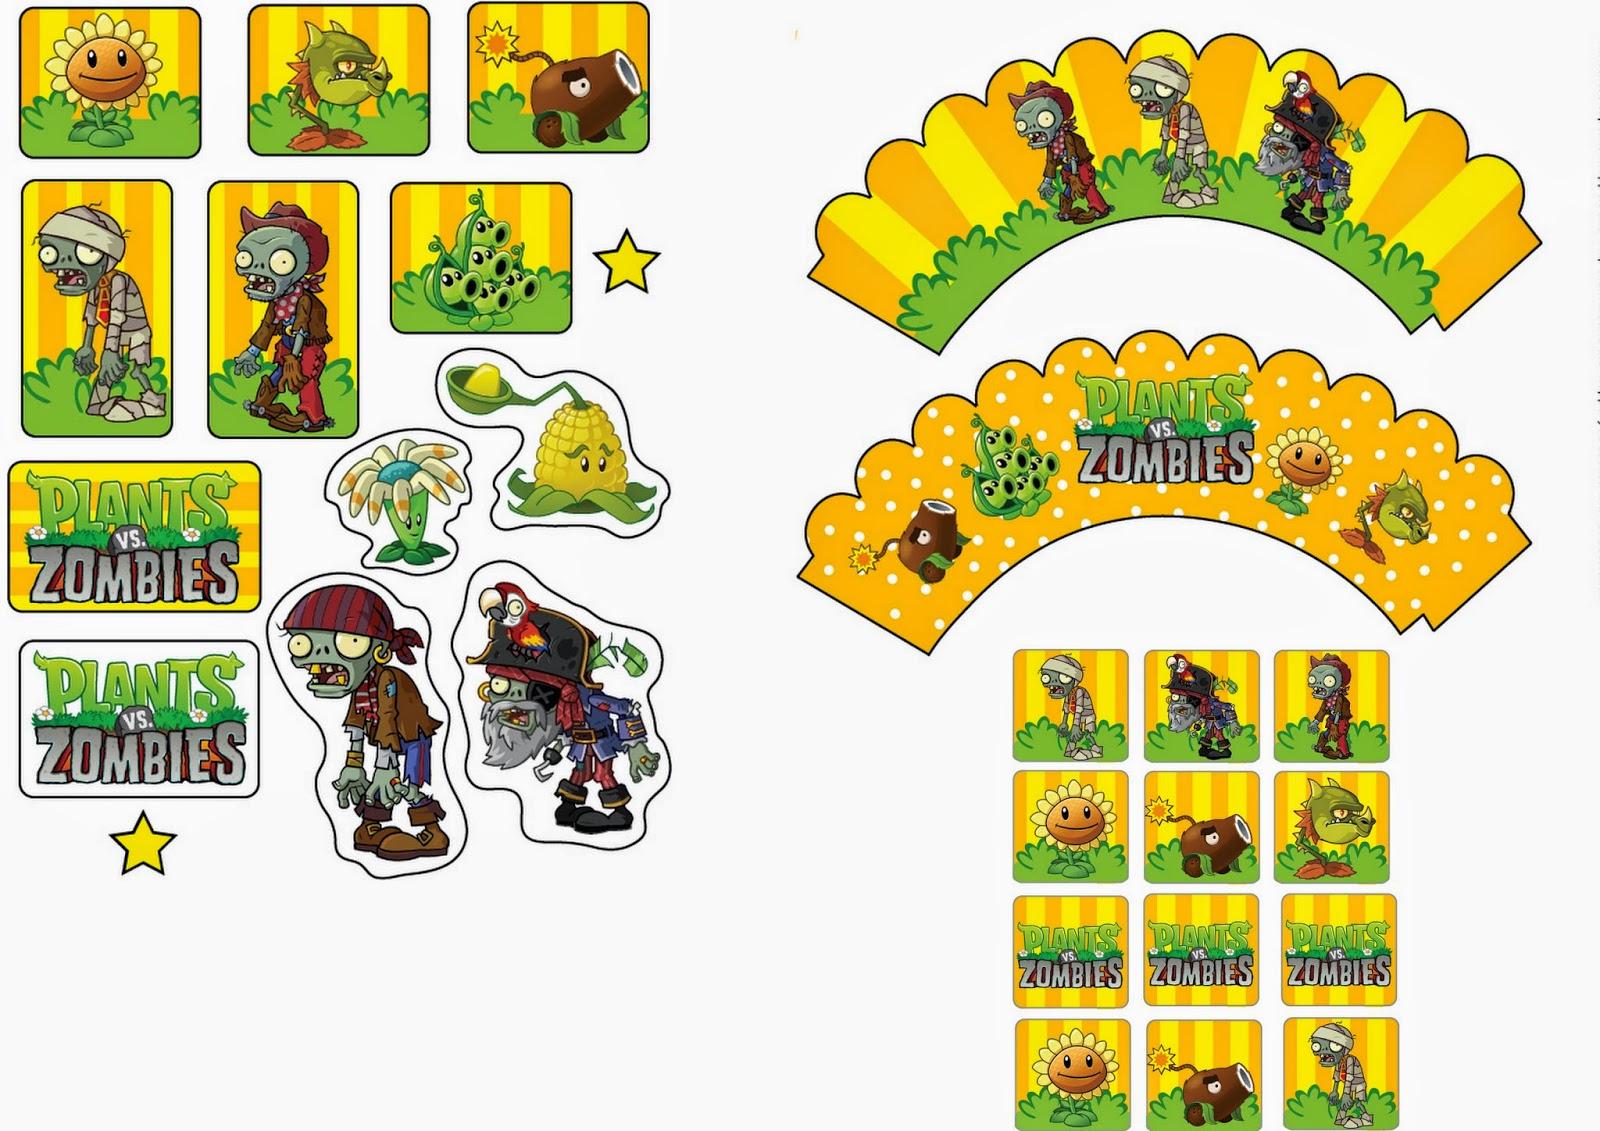 Plants Vs Zombies: Free Printable Cupcake Toppers And Wrappers. | Oh - Plants Vs Zombies Free Printable Invitations